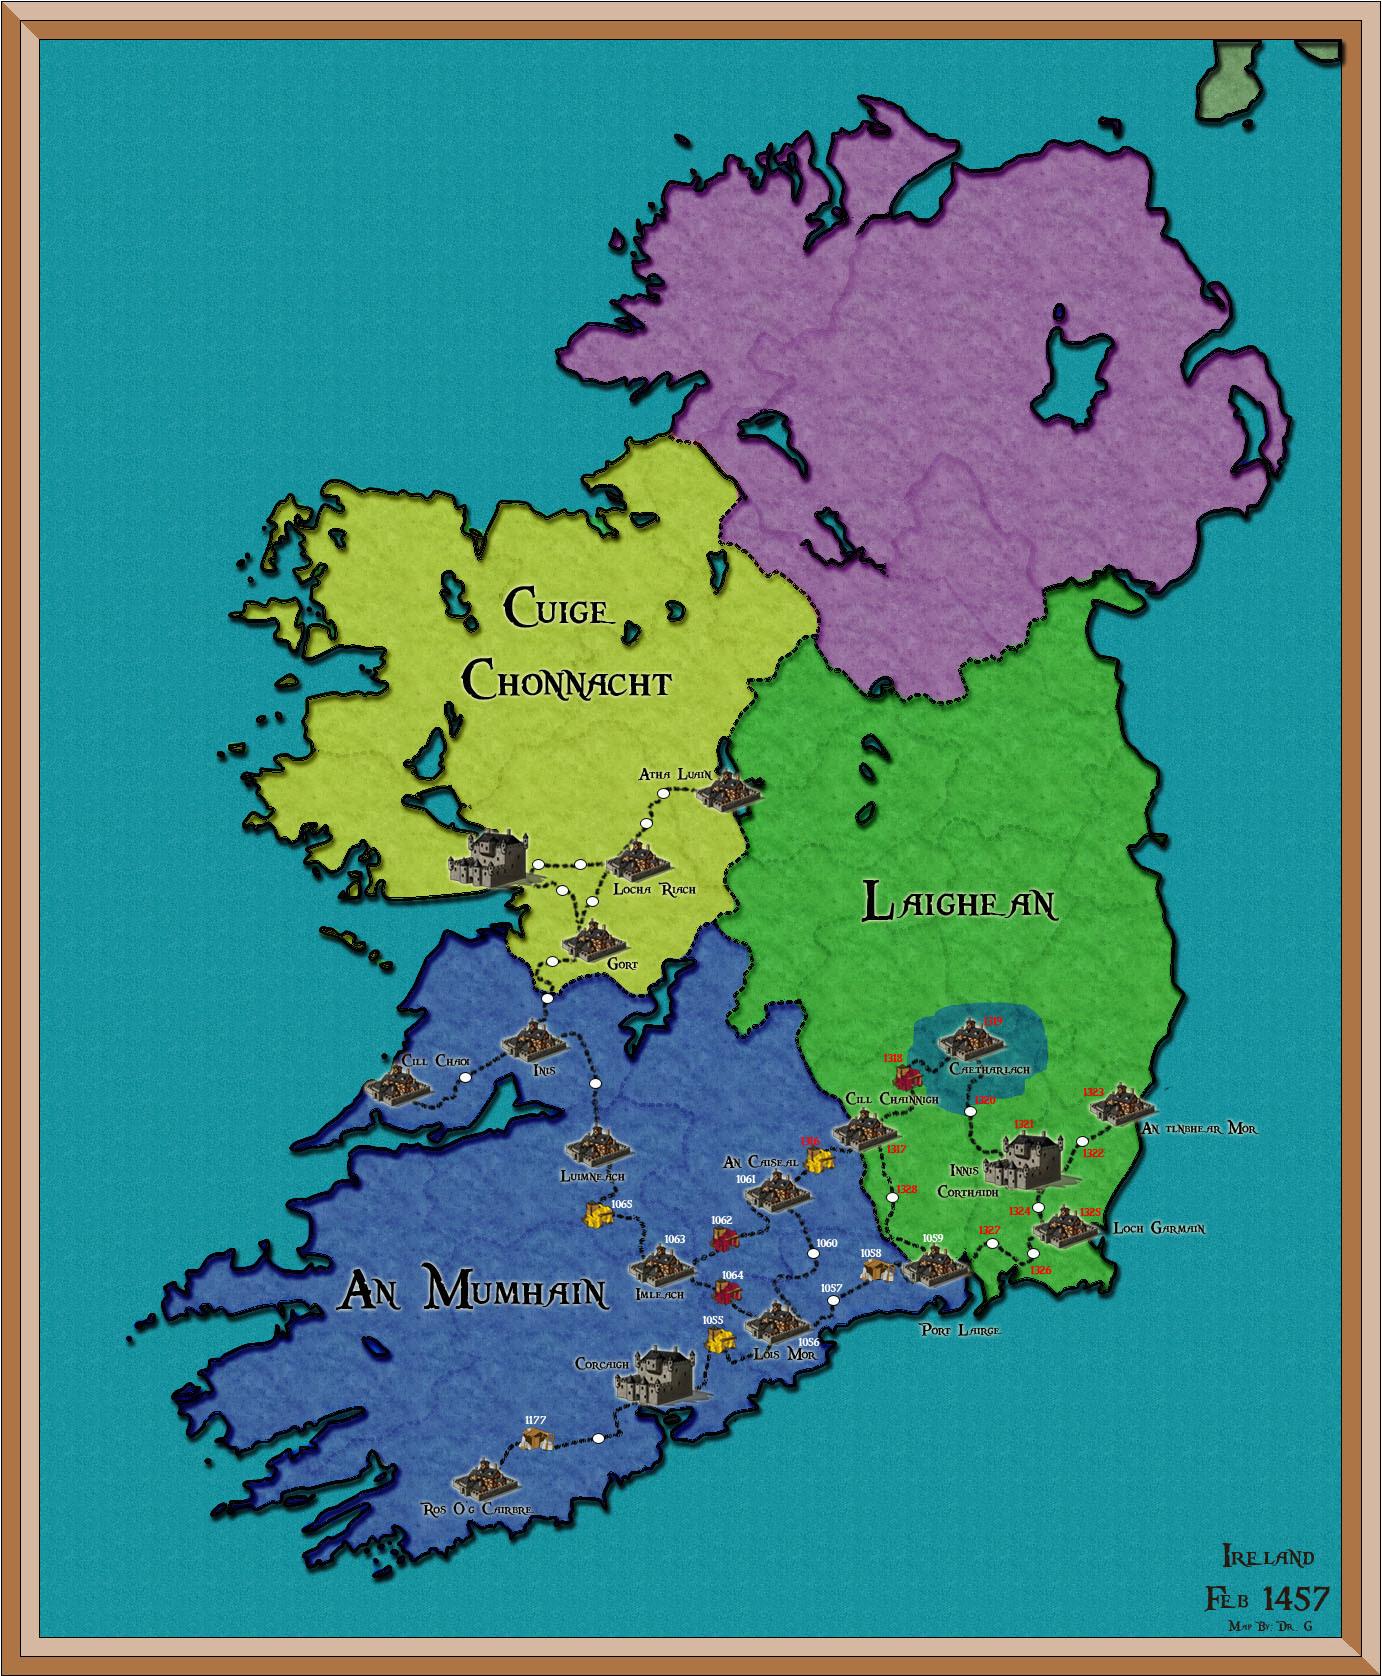 Image - Map of Eire 1457 02.jpg - Renaissance Kingdoms